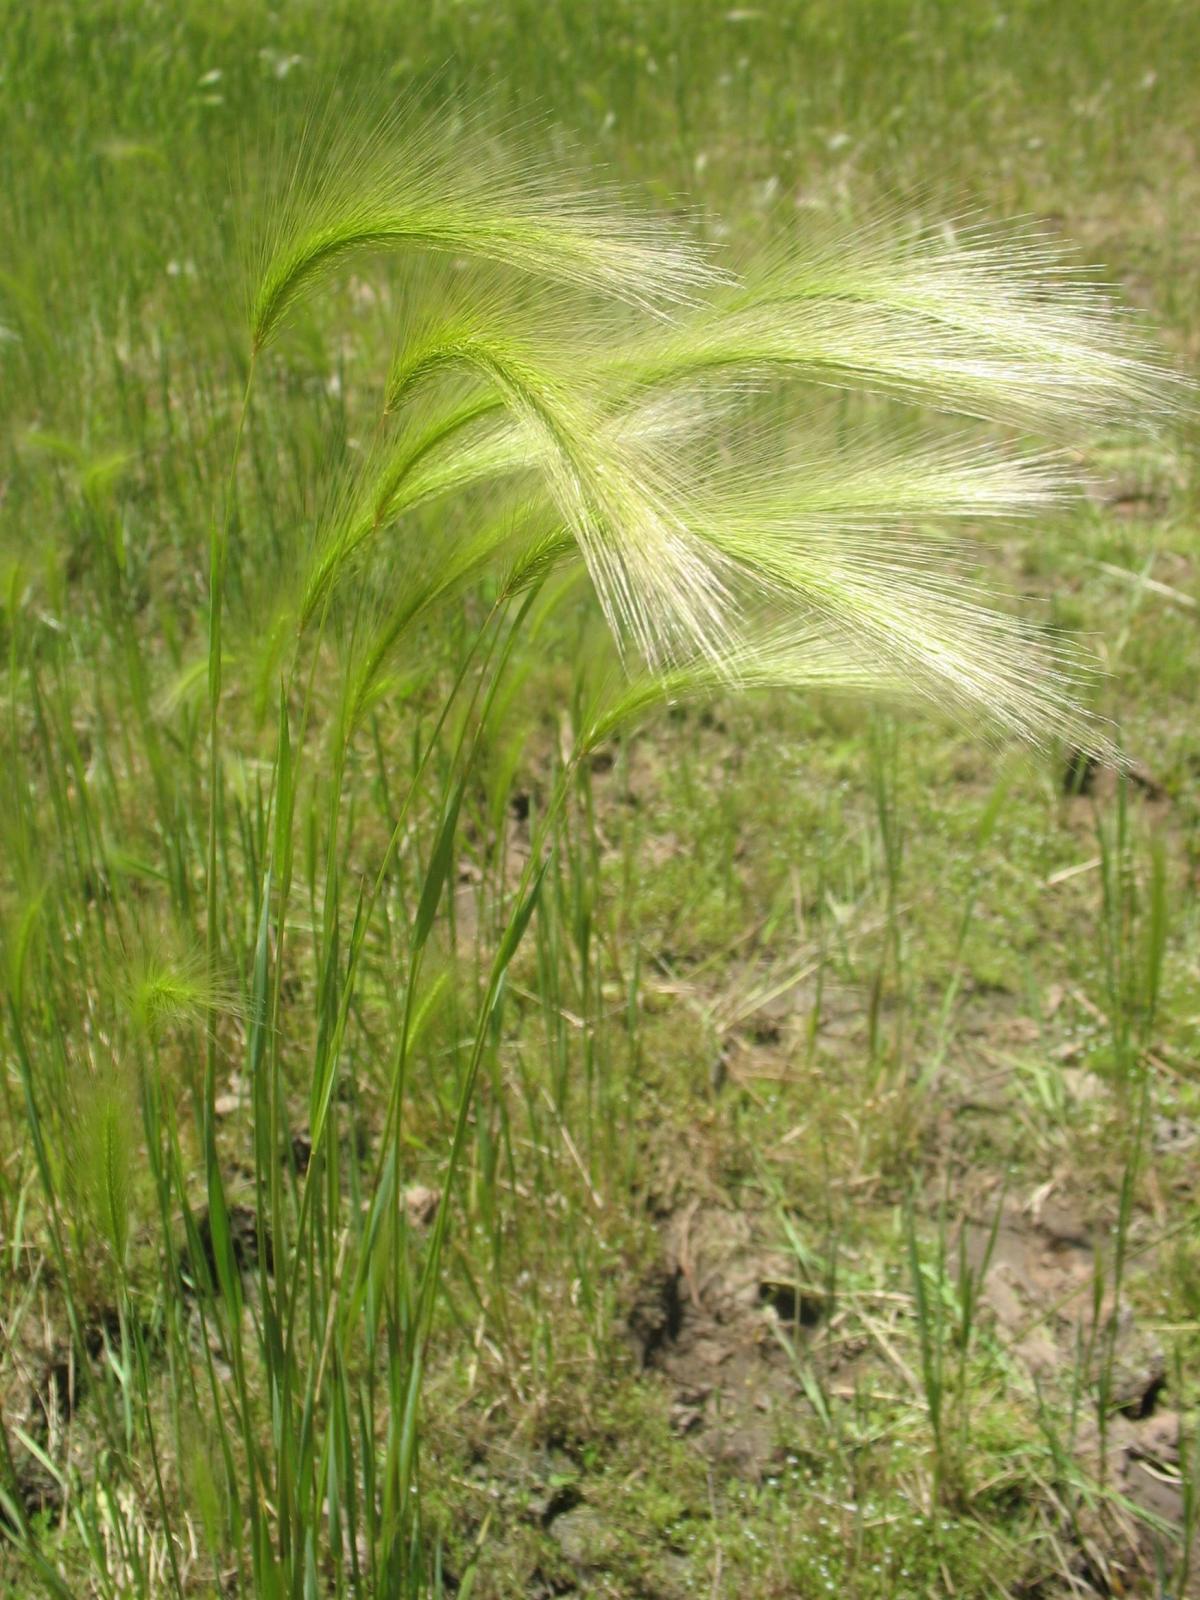 Foxtail barley seed heads